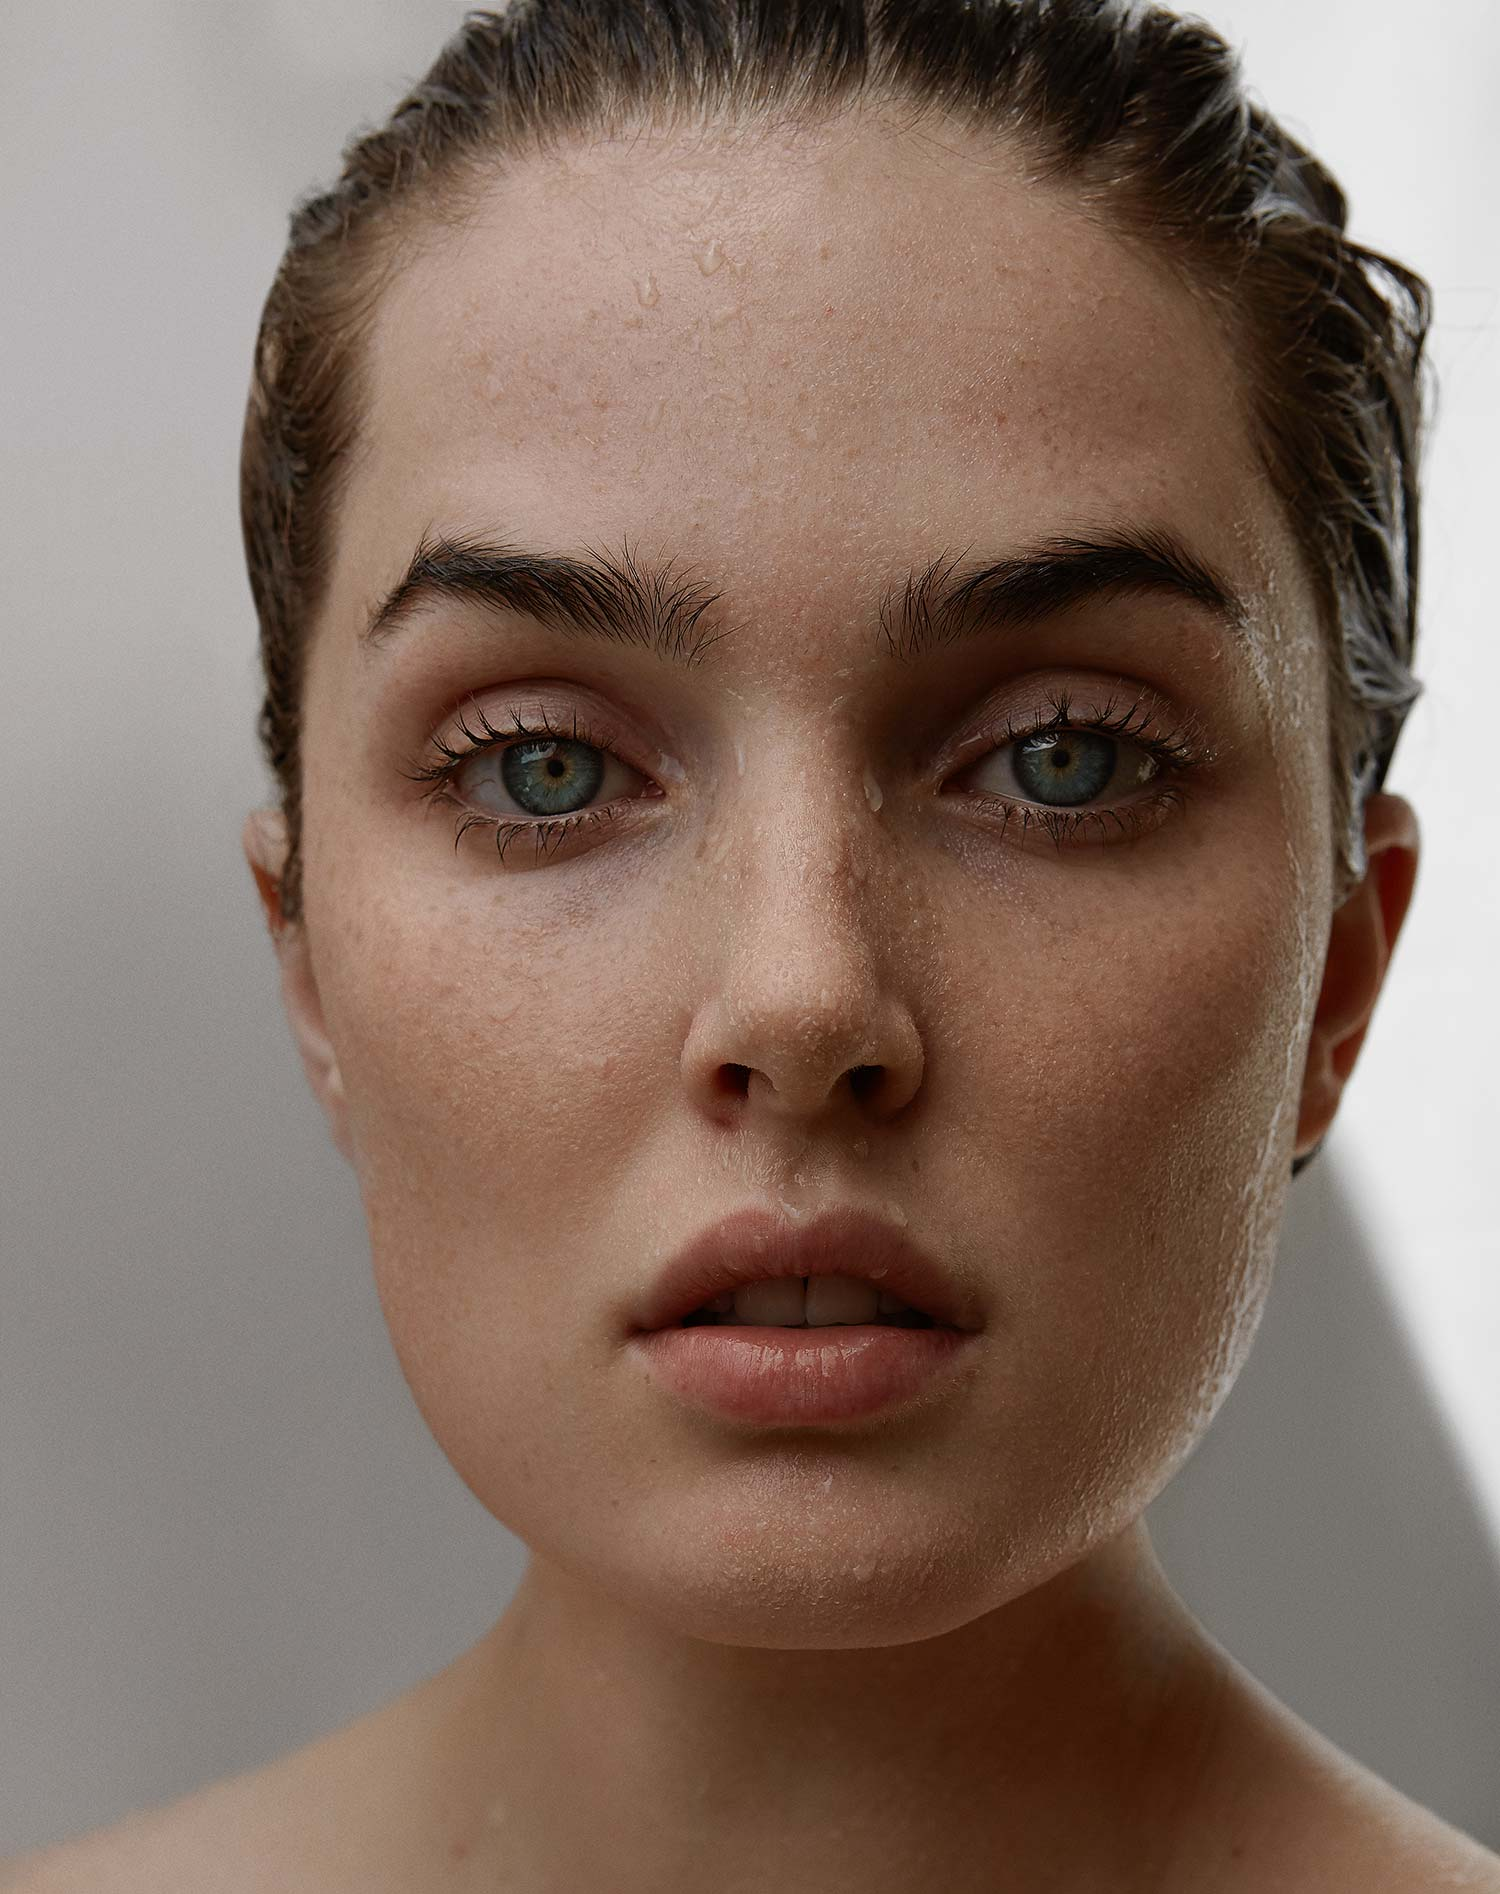 Jessica Wall hair make up by Teresa Hofmeister